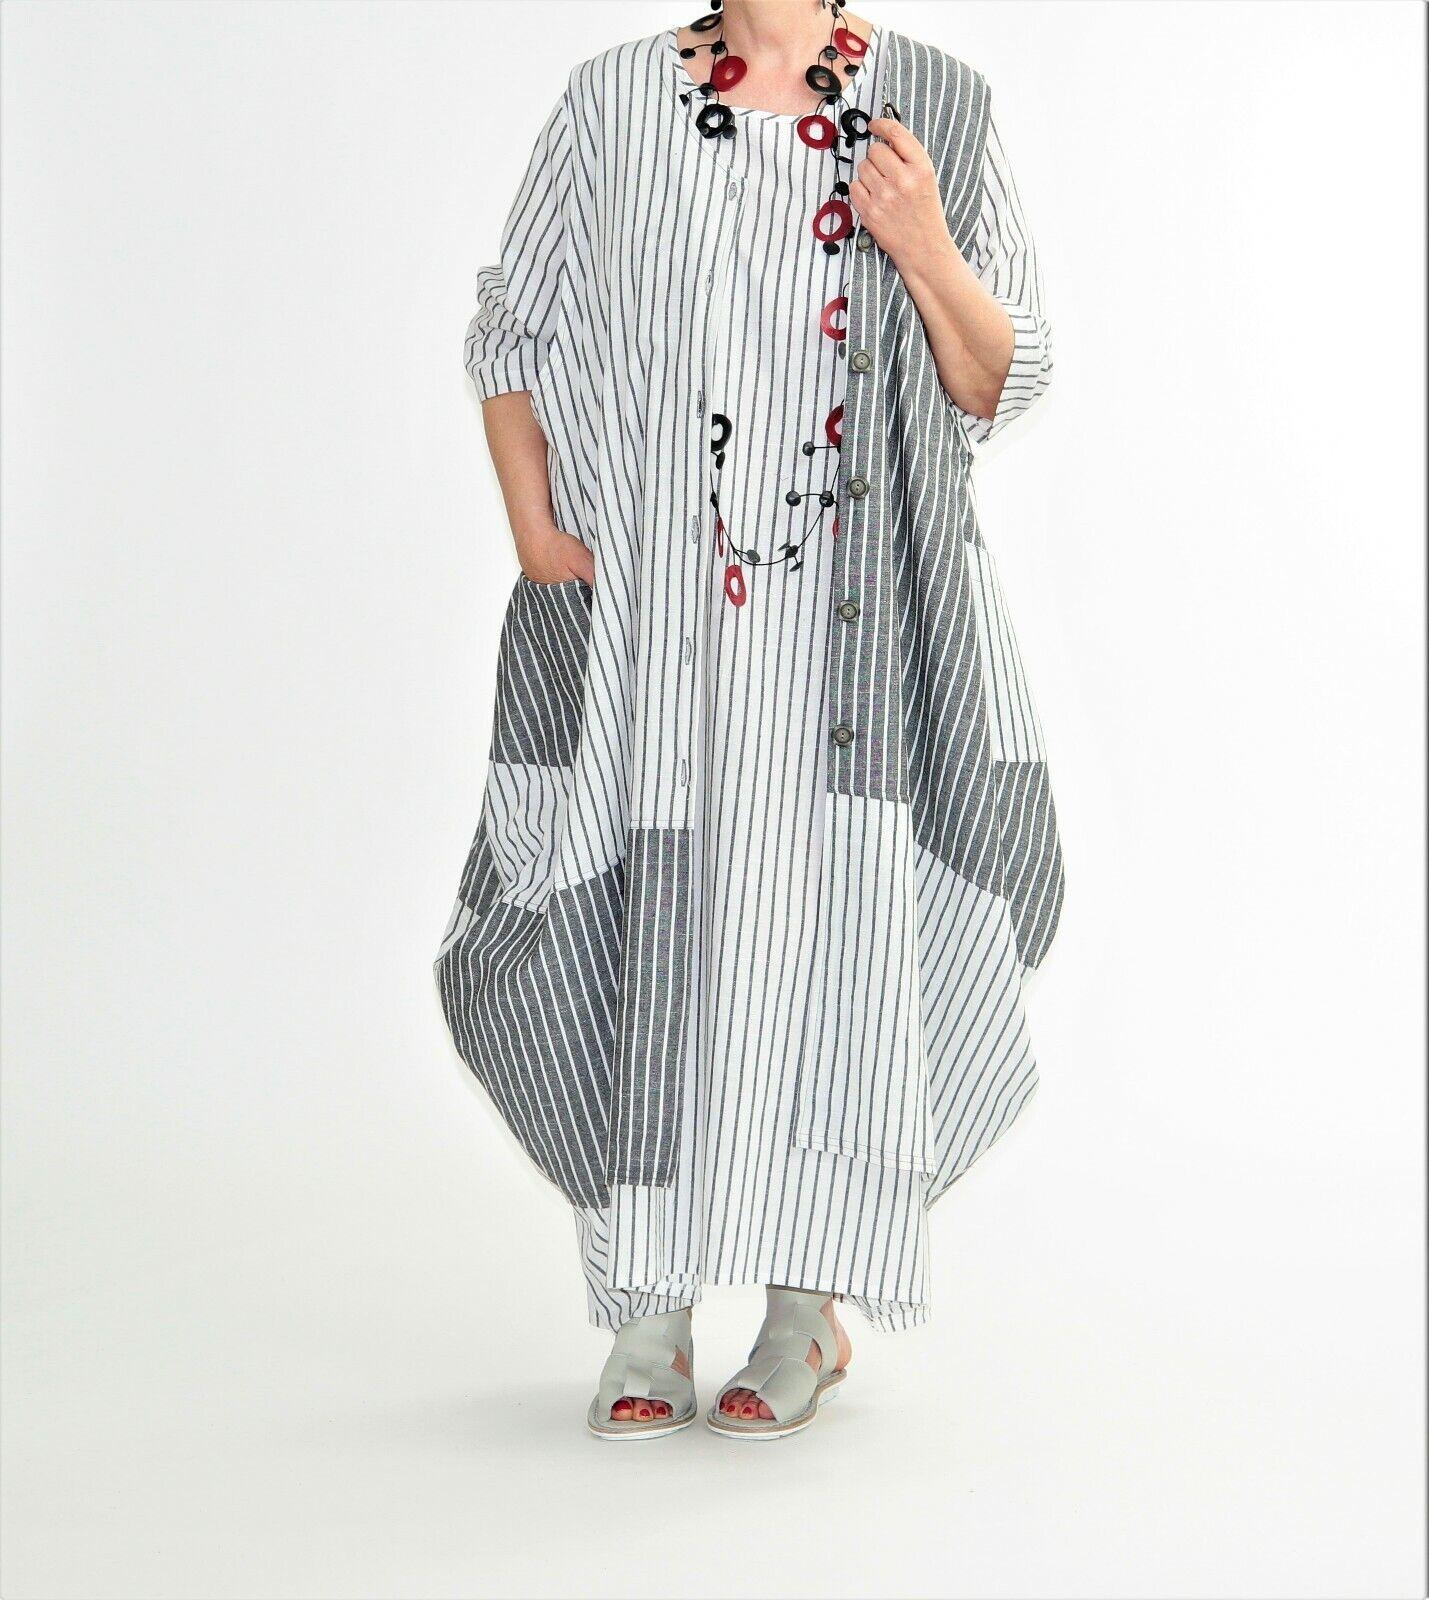 a14f7ca7db85f5 AKH Fashion Ballon-Leinen-Weste 46,48,50,52,54,56 weiß-grau ...